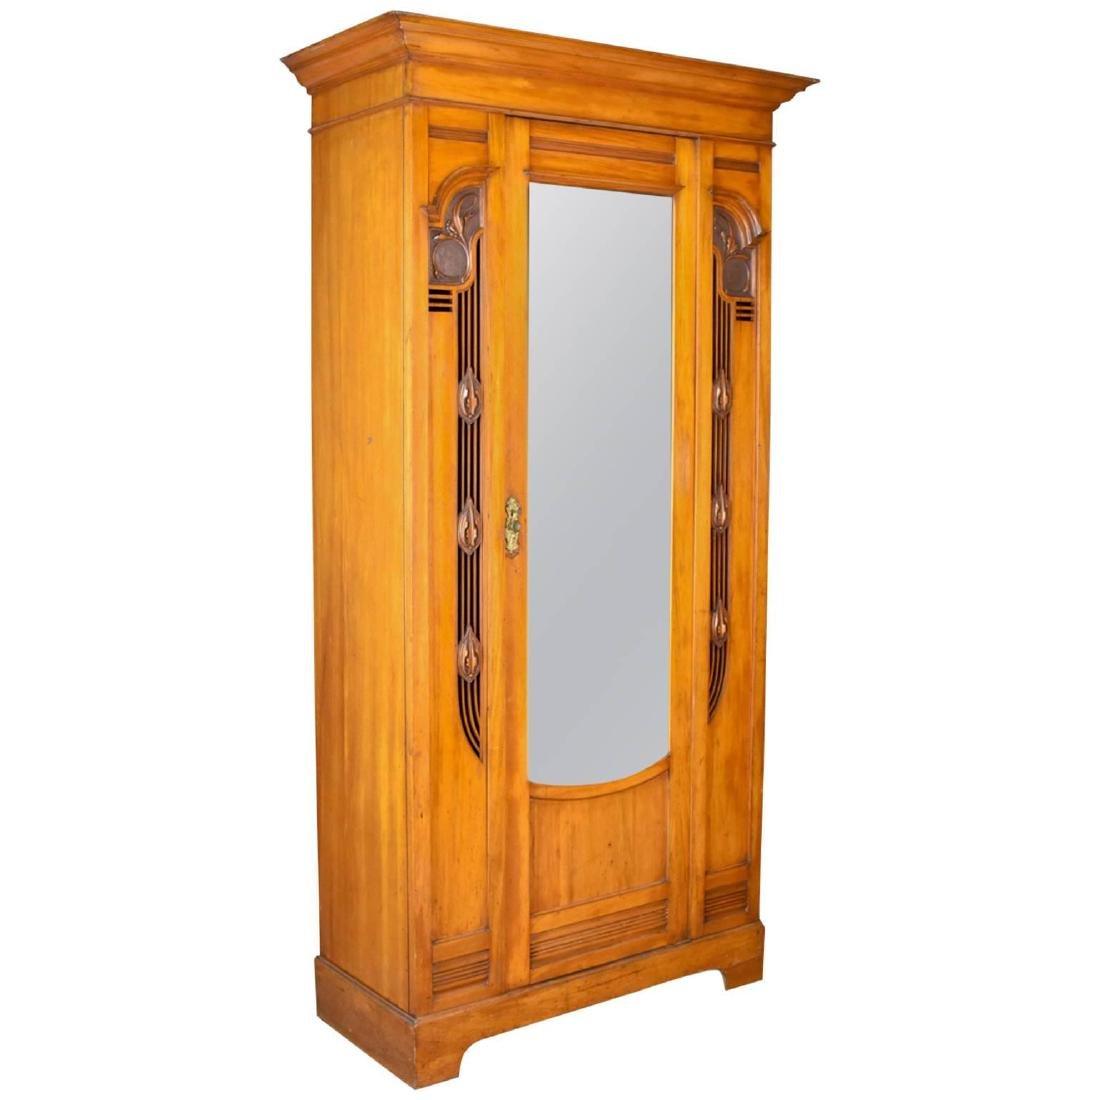 Antique Single Wardrobe, Satinwood, English, Compactum,